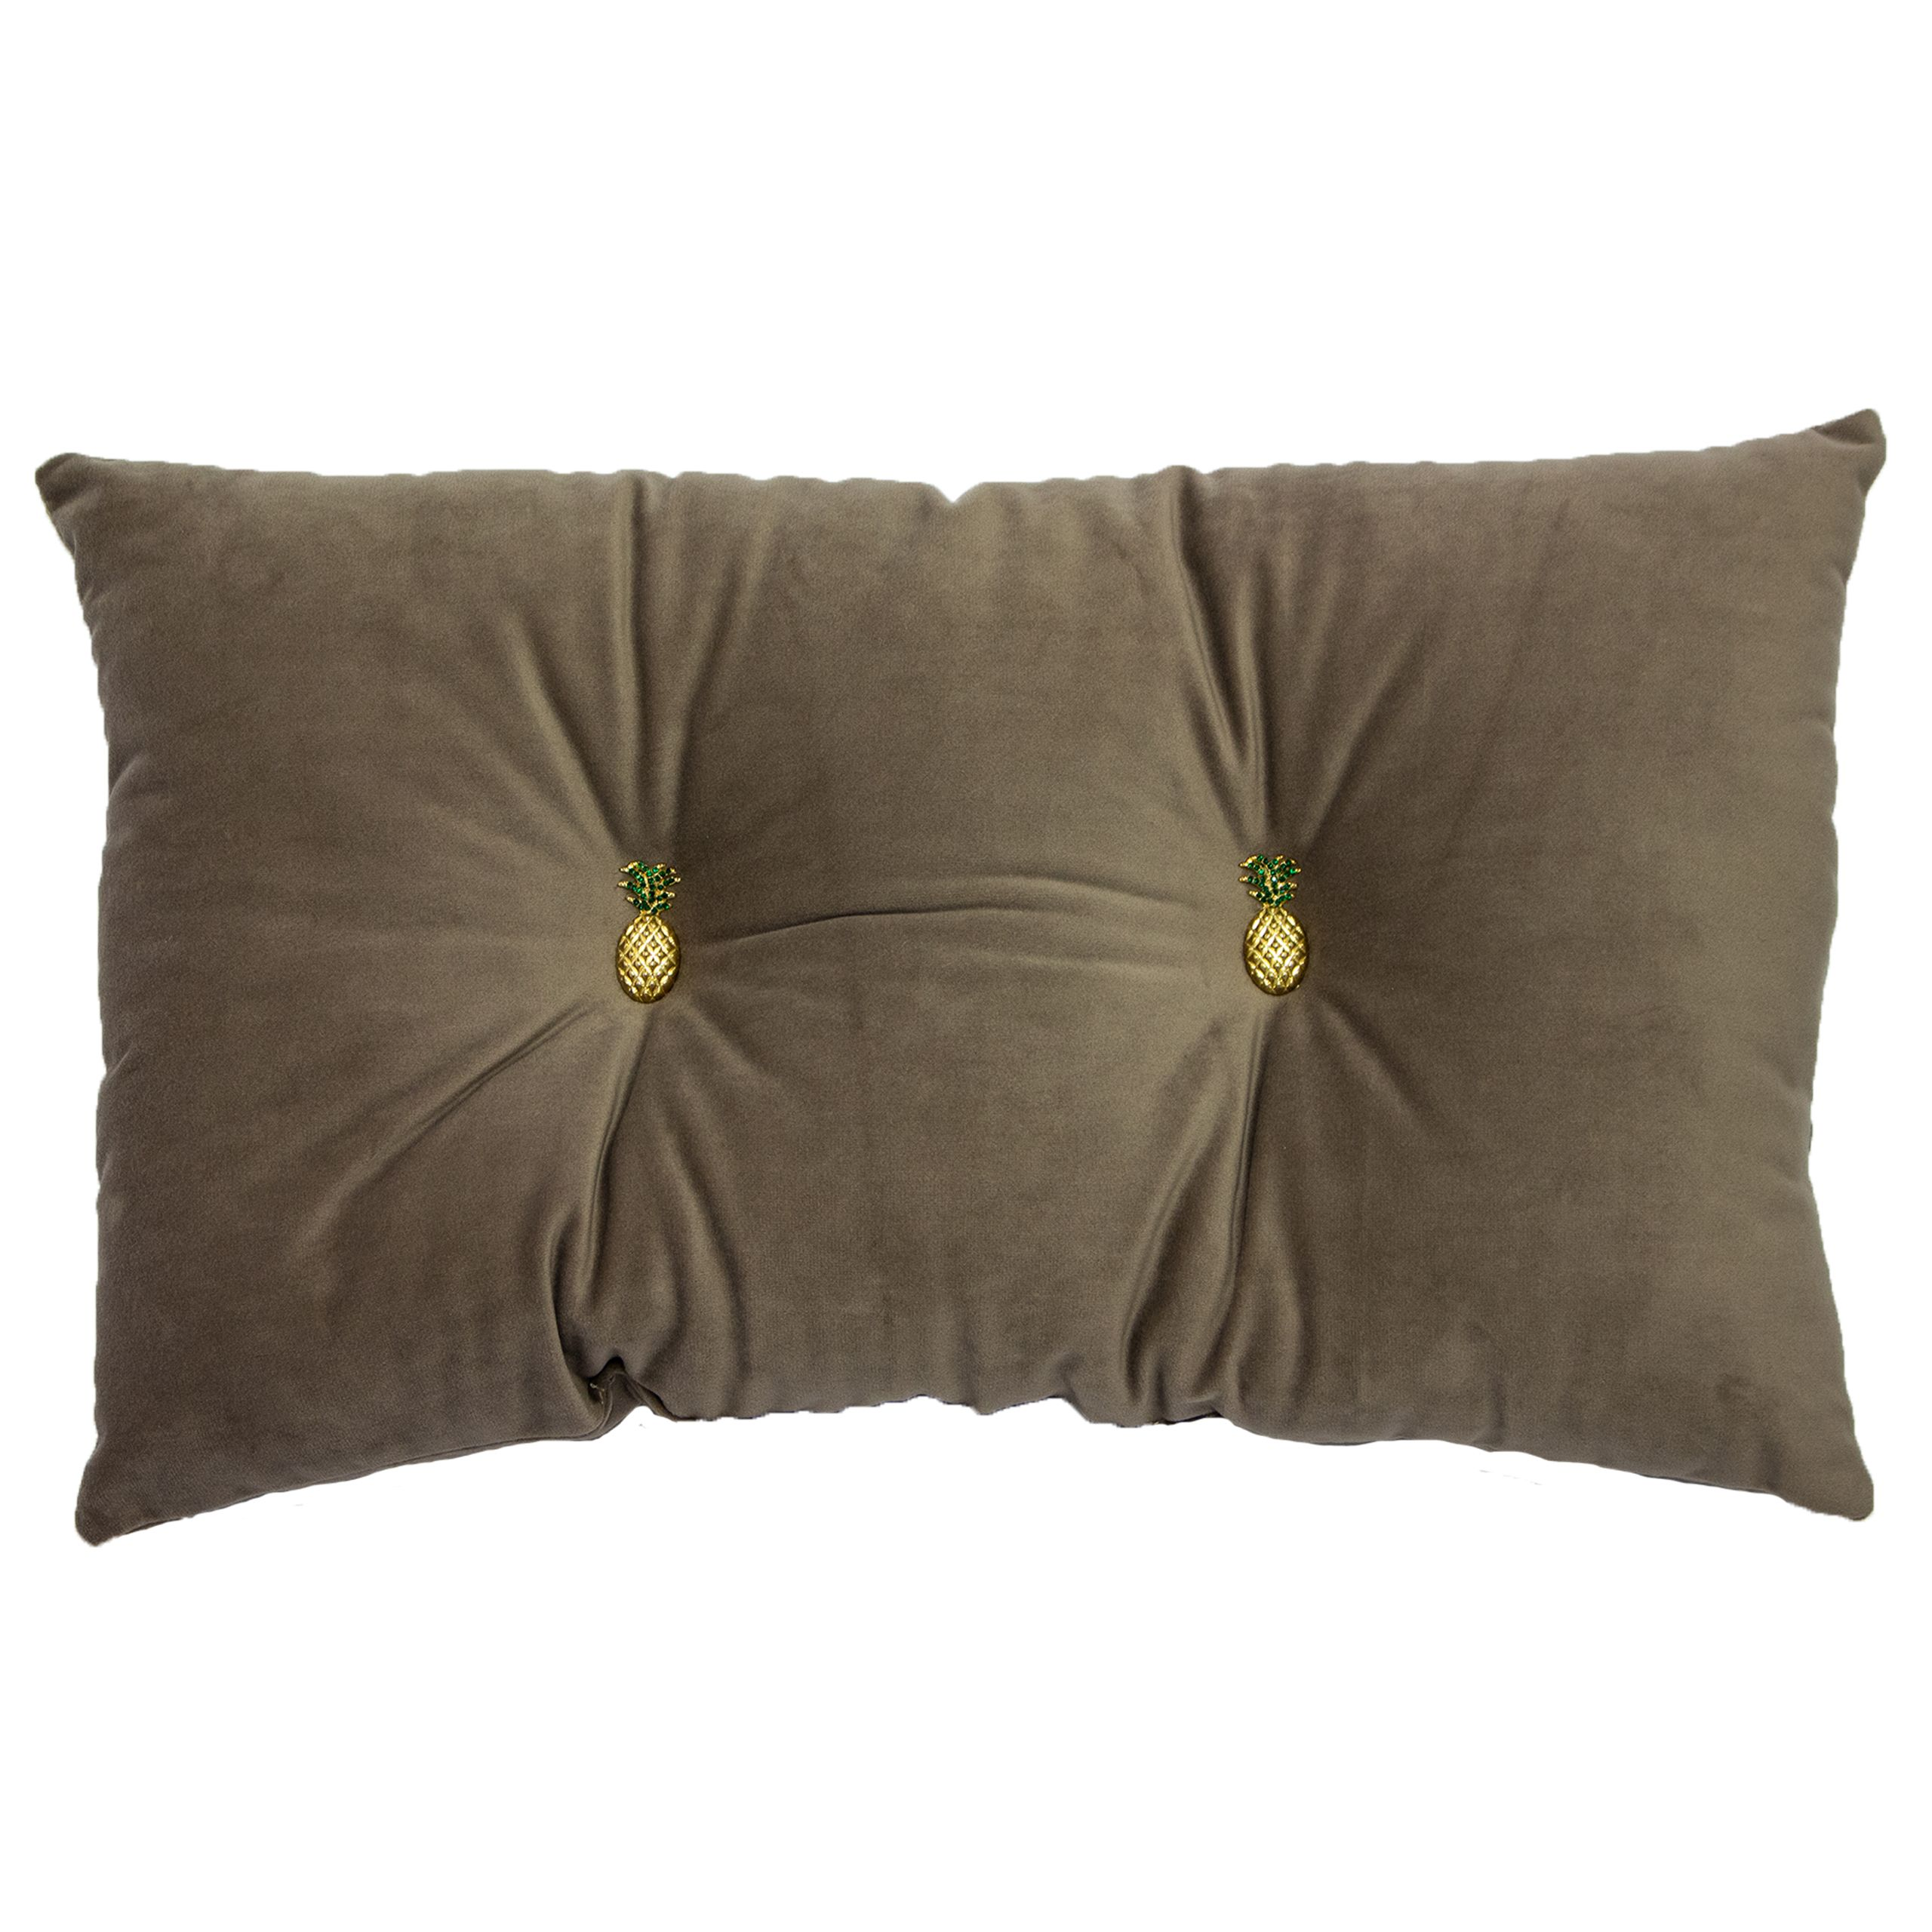 Pineapple 30X50 Pf Cushion Grey